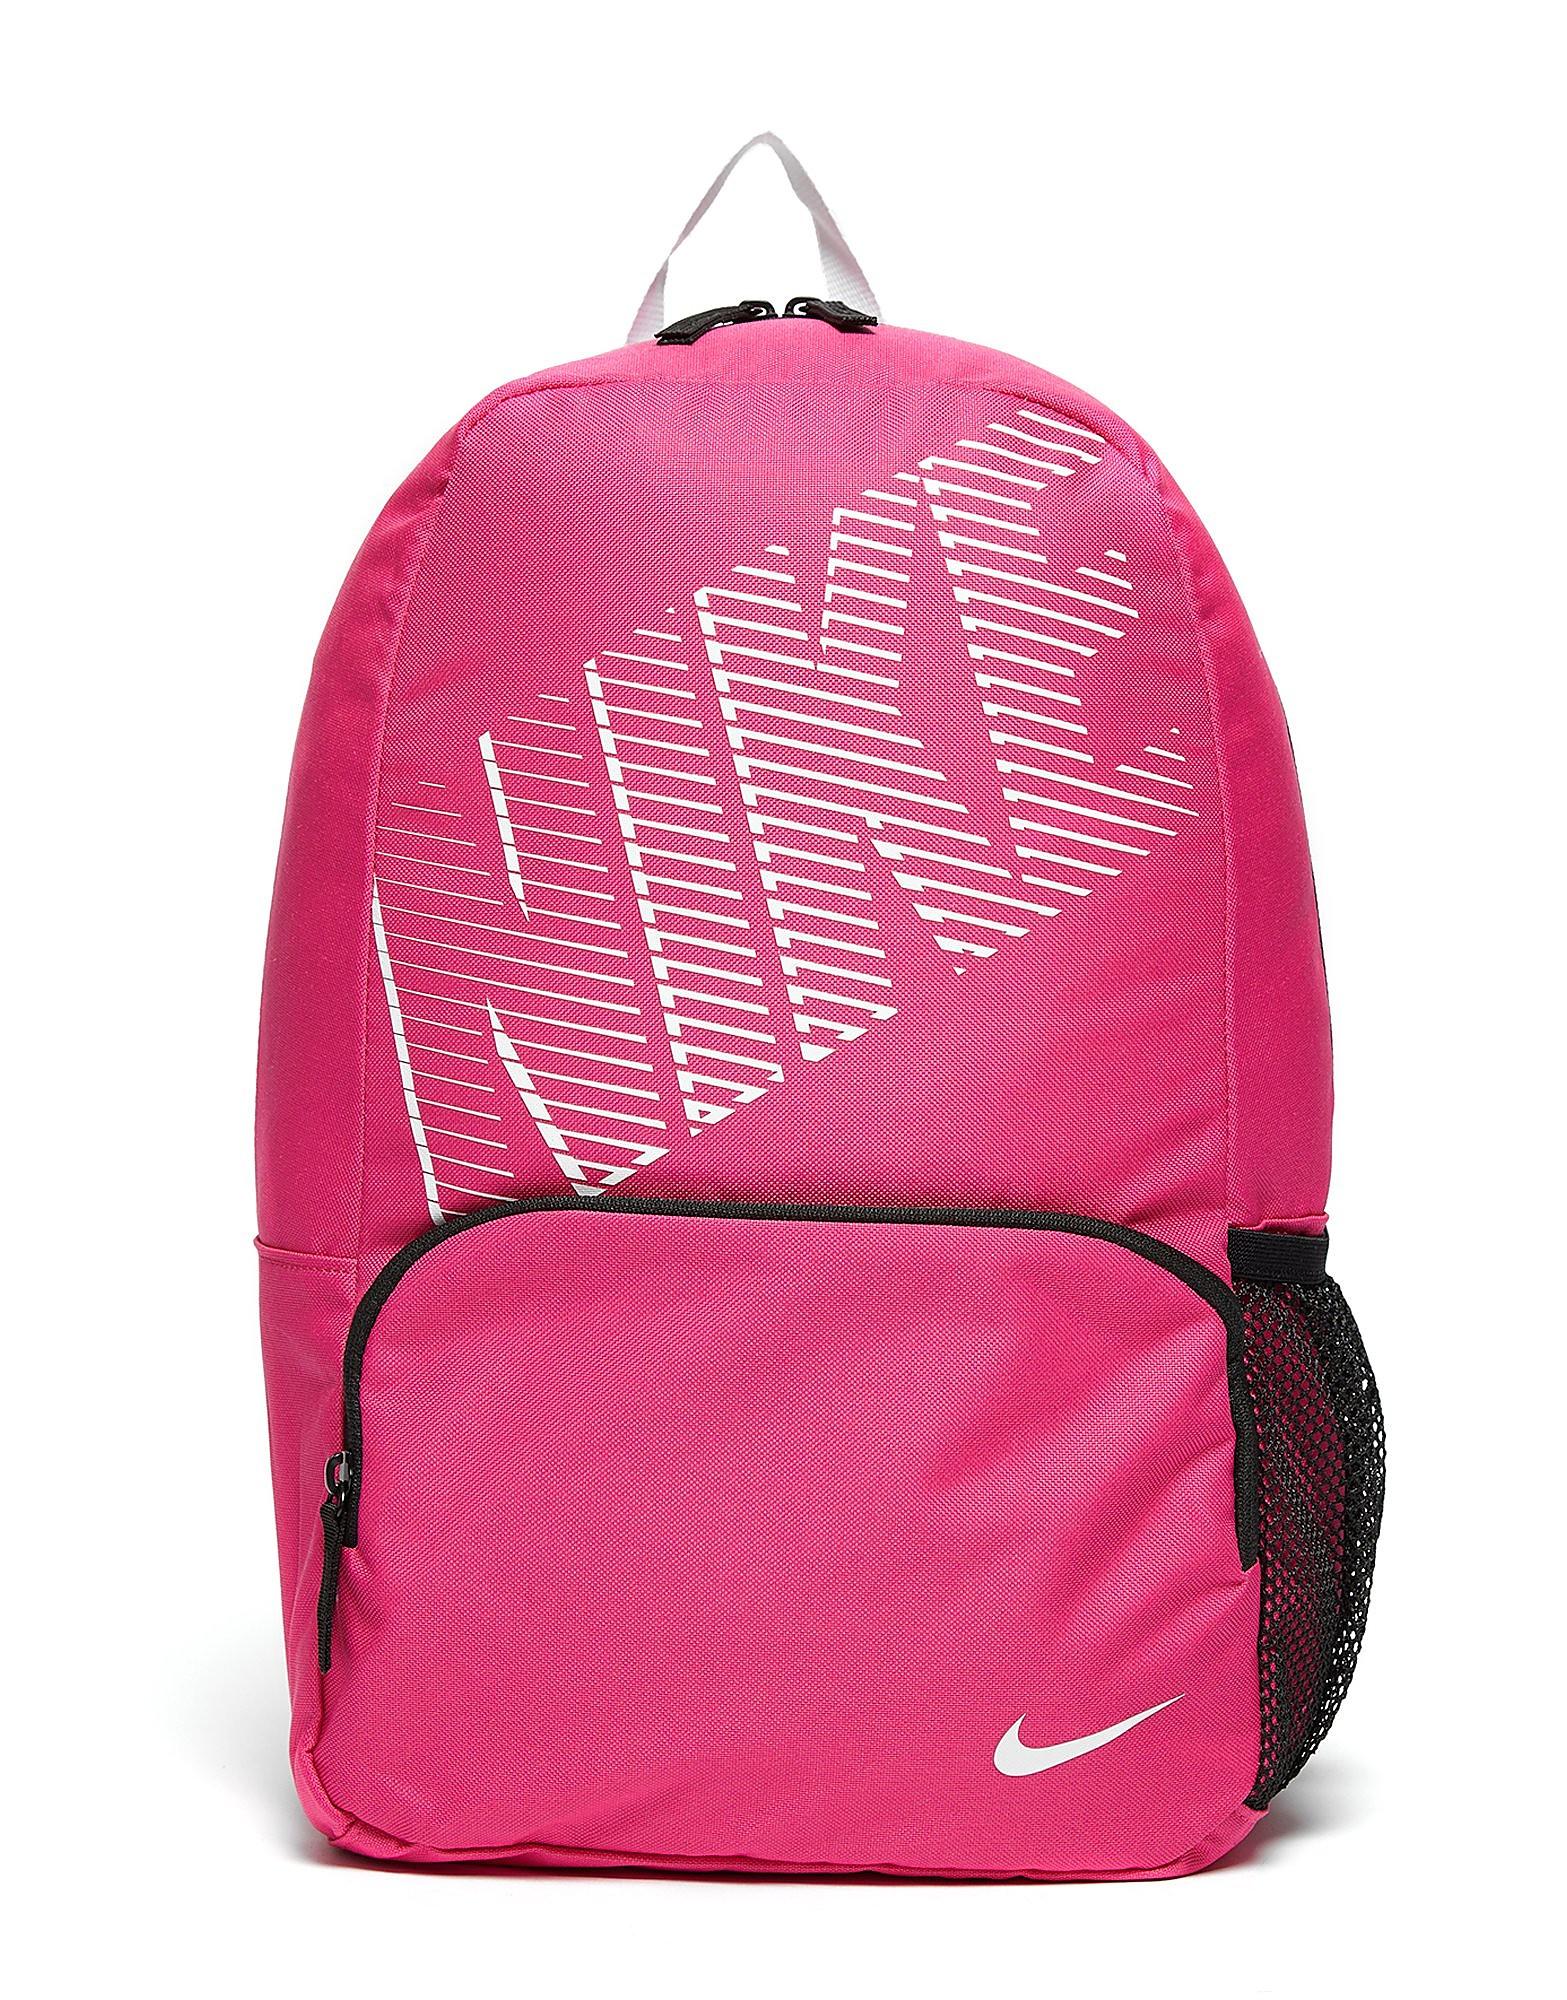 Nike Classic Turf Backpack - Hot Pink - Womens, Hot Pink